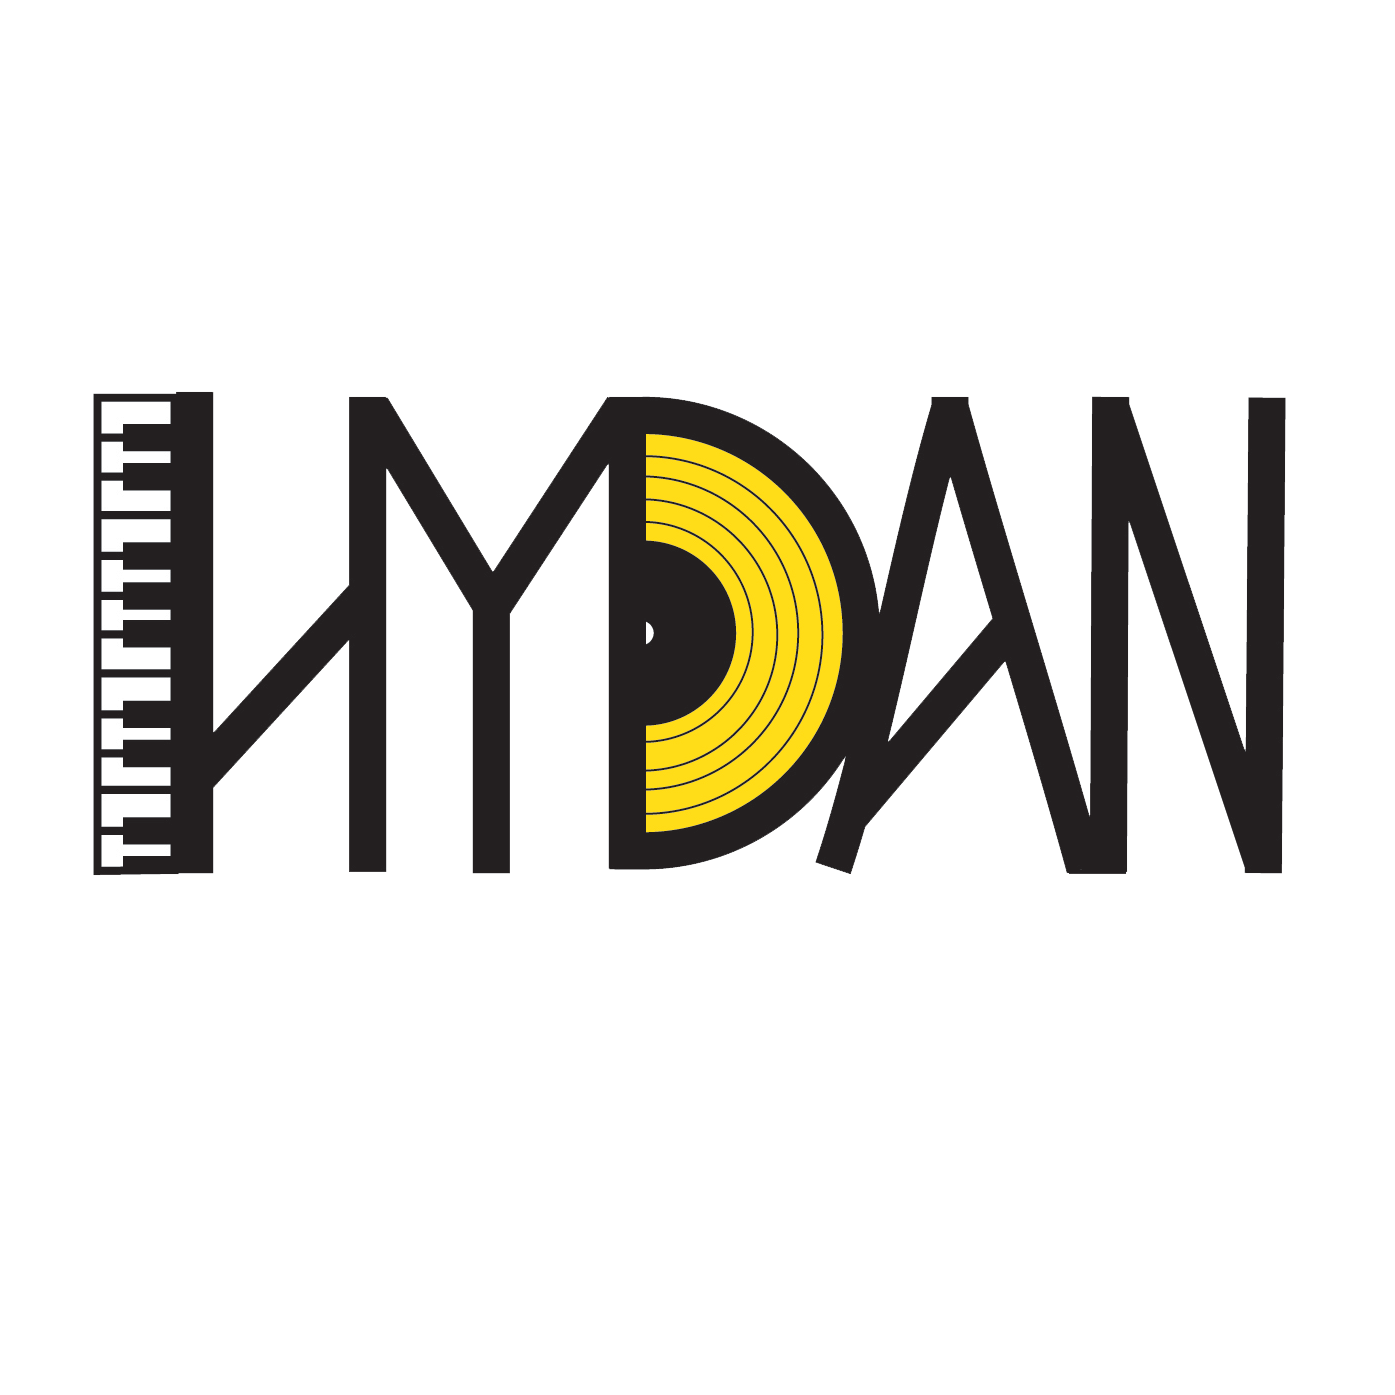 Hydan Entertainment